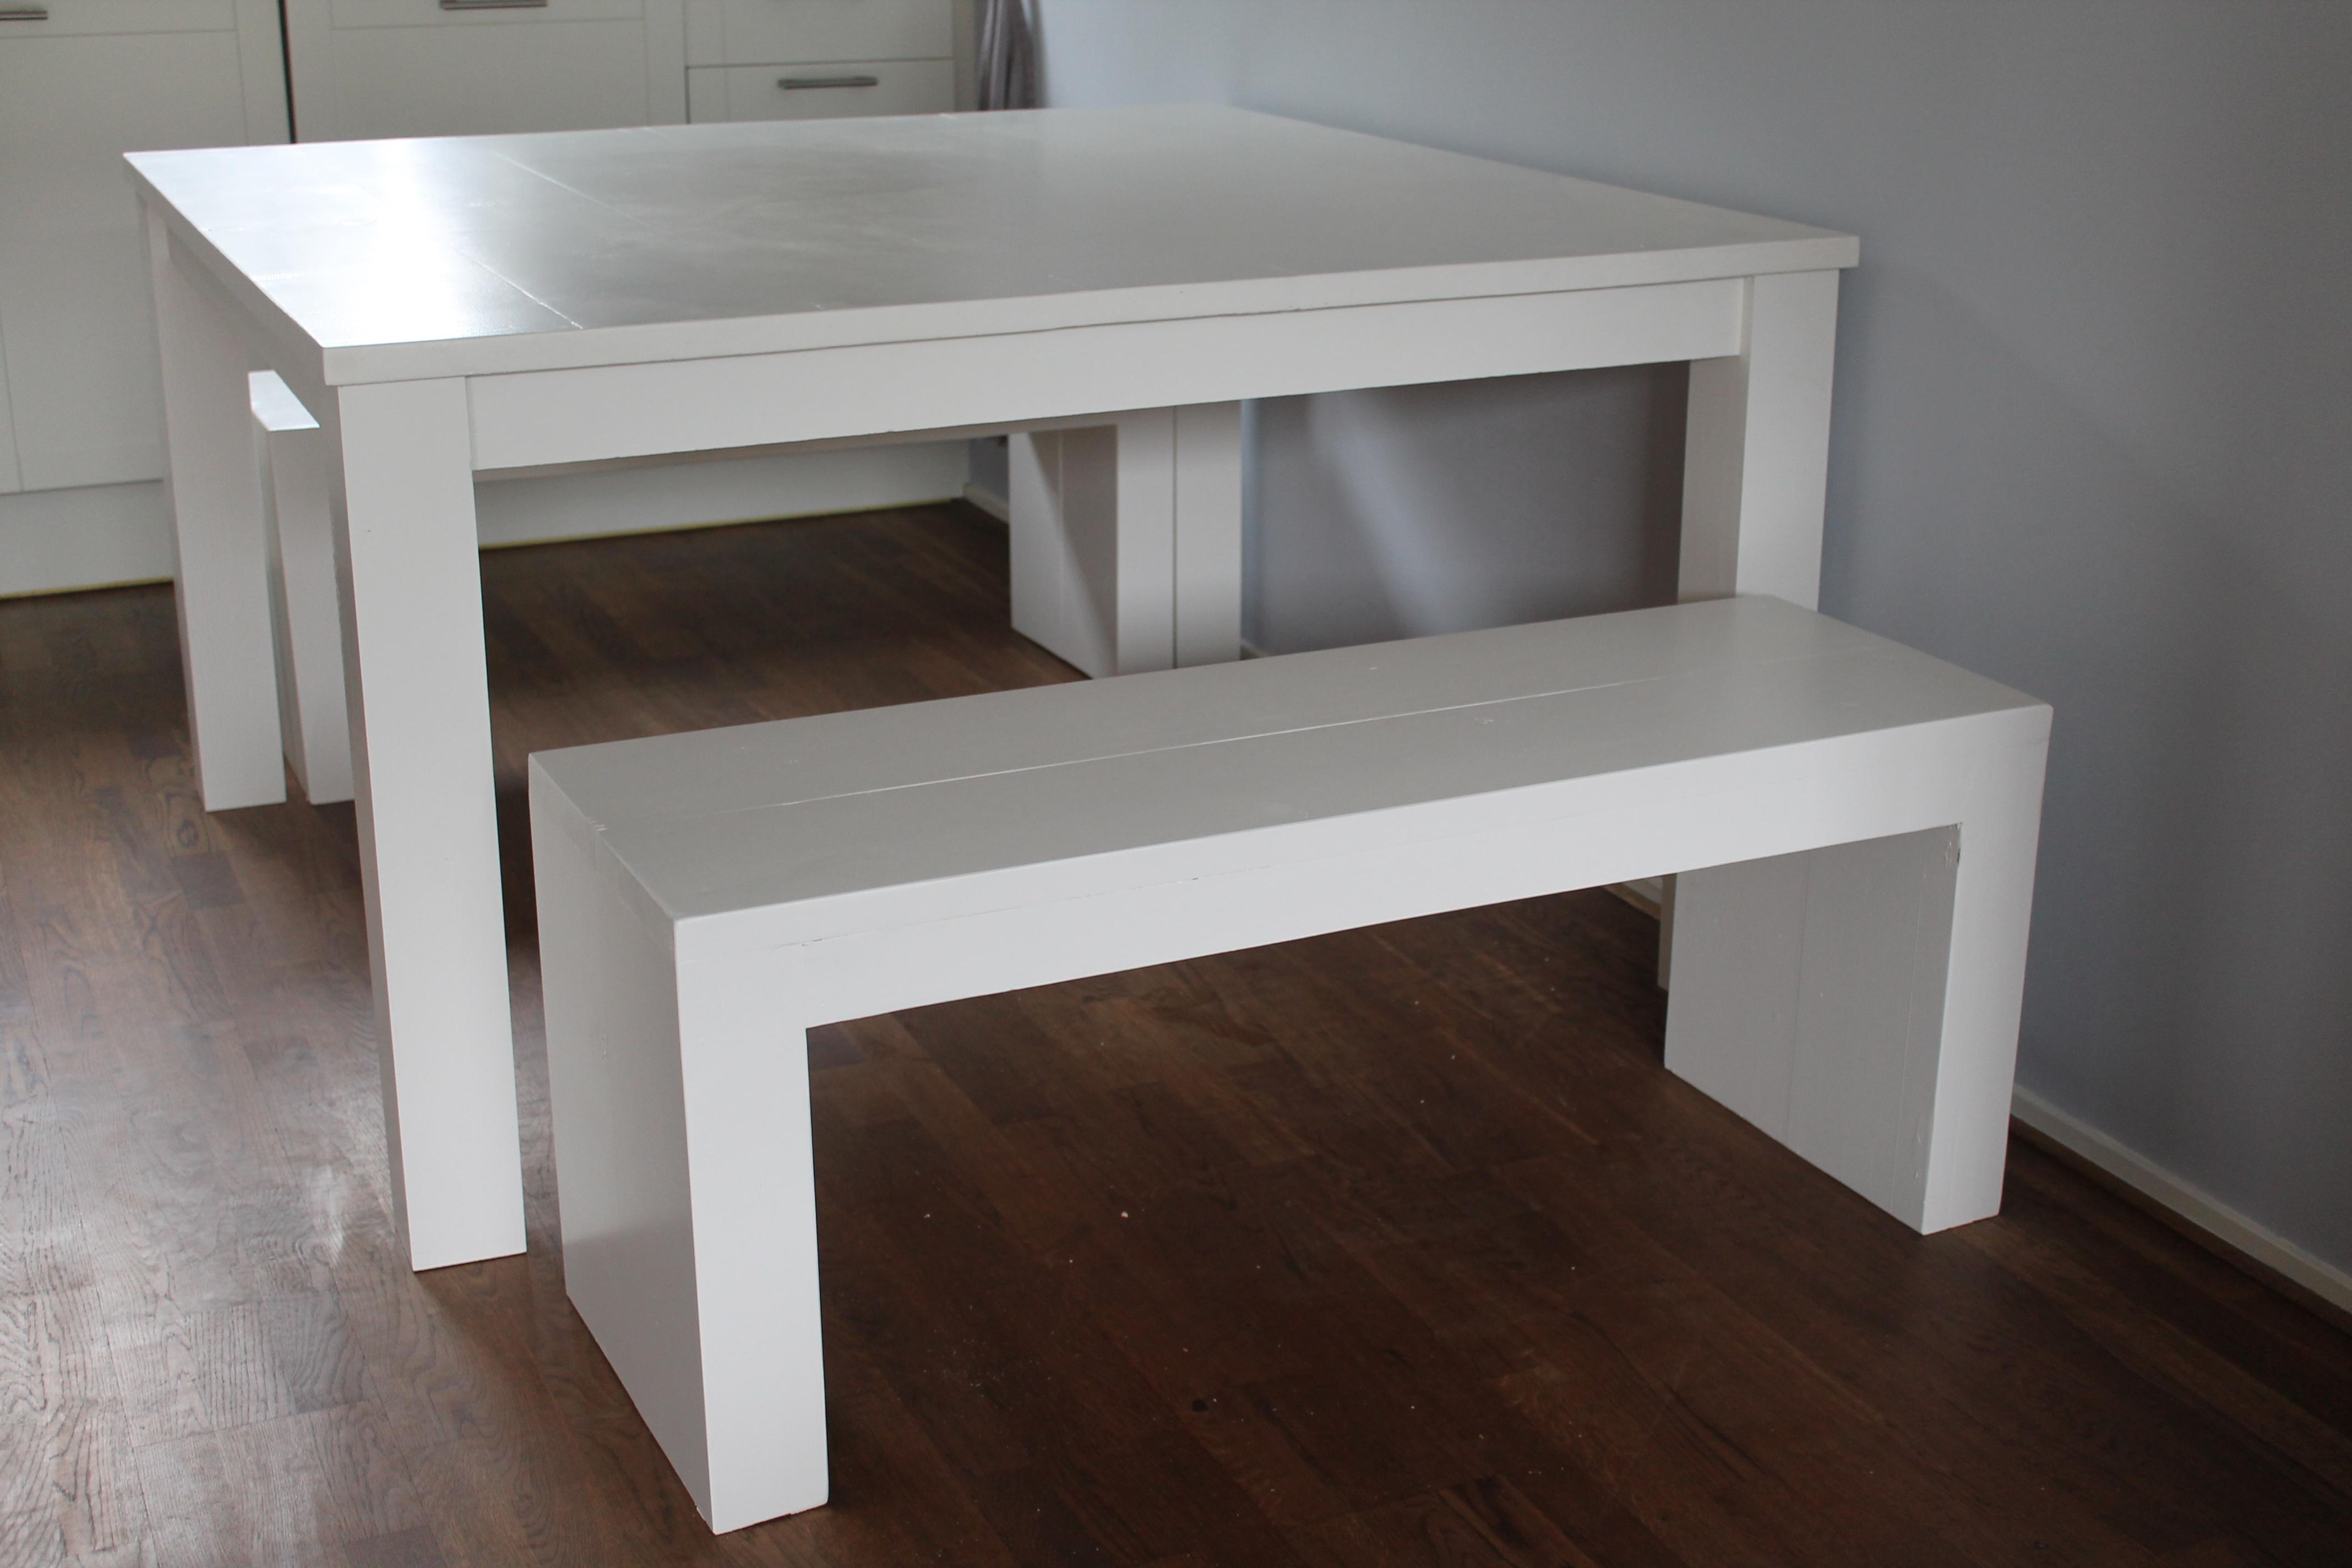 Vierkante Eettafel 130x130.Eettafel Vierkant